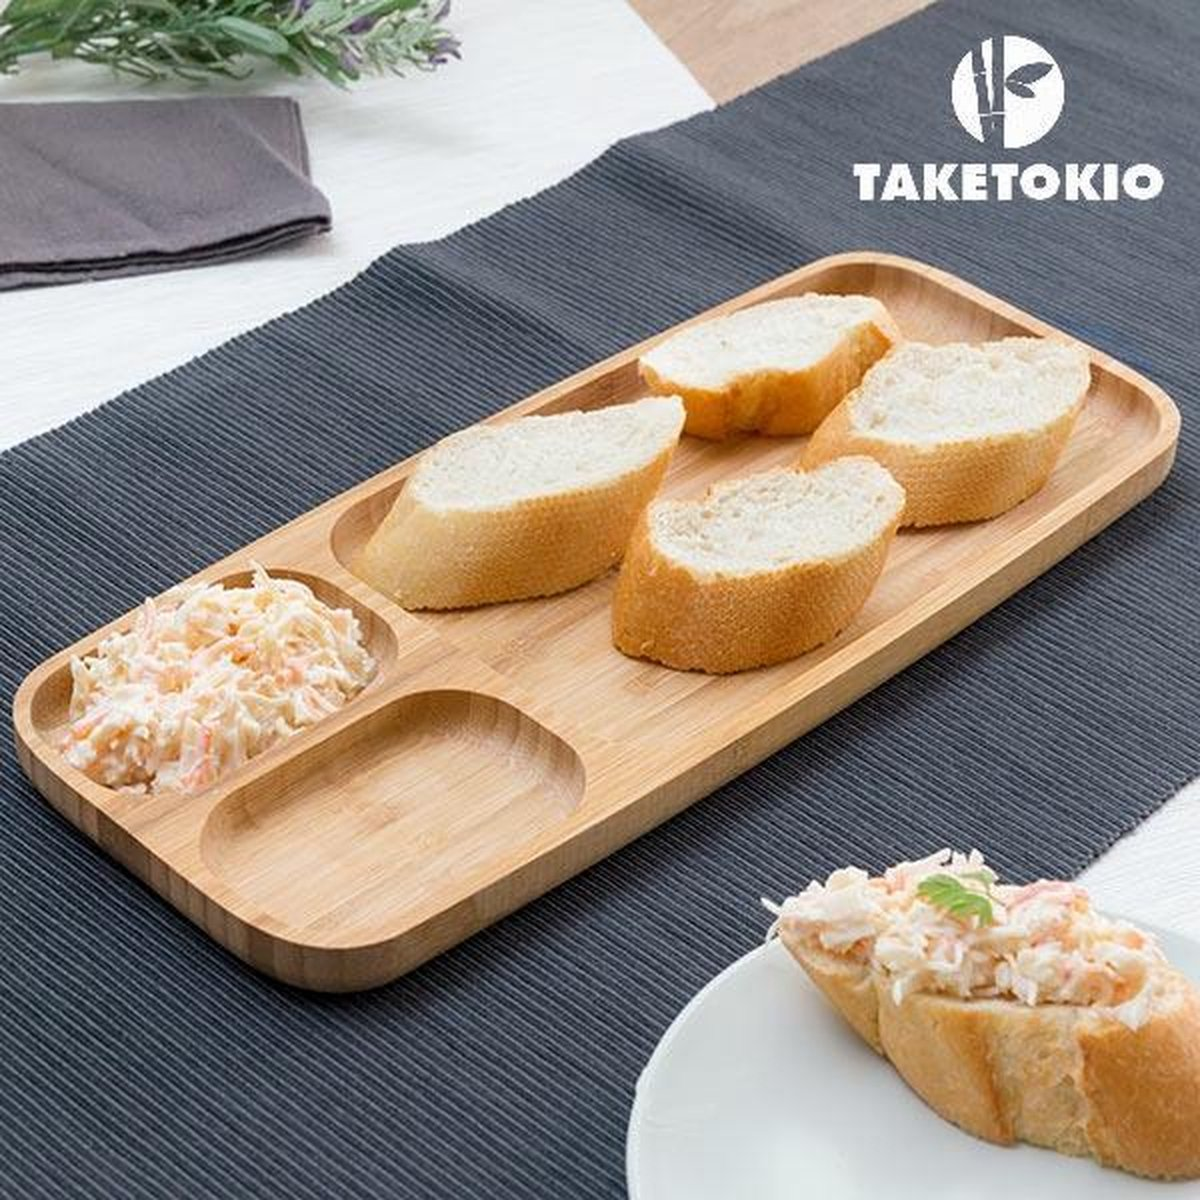 TakeTokio Bamboe Dienblad met Compartimenten